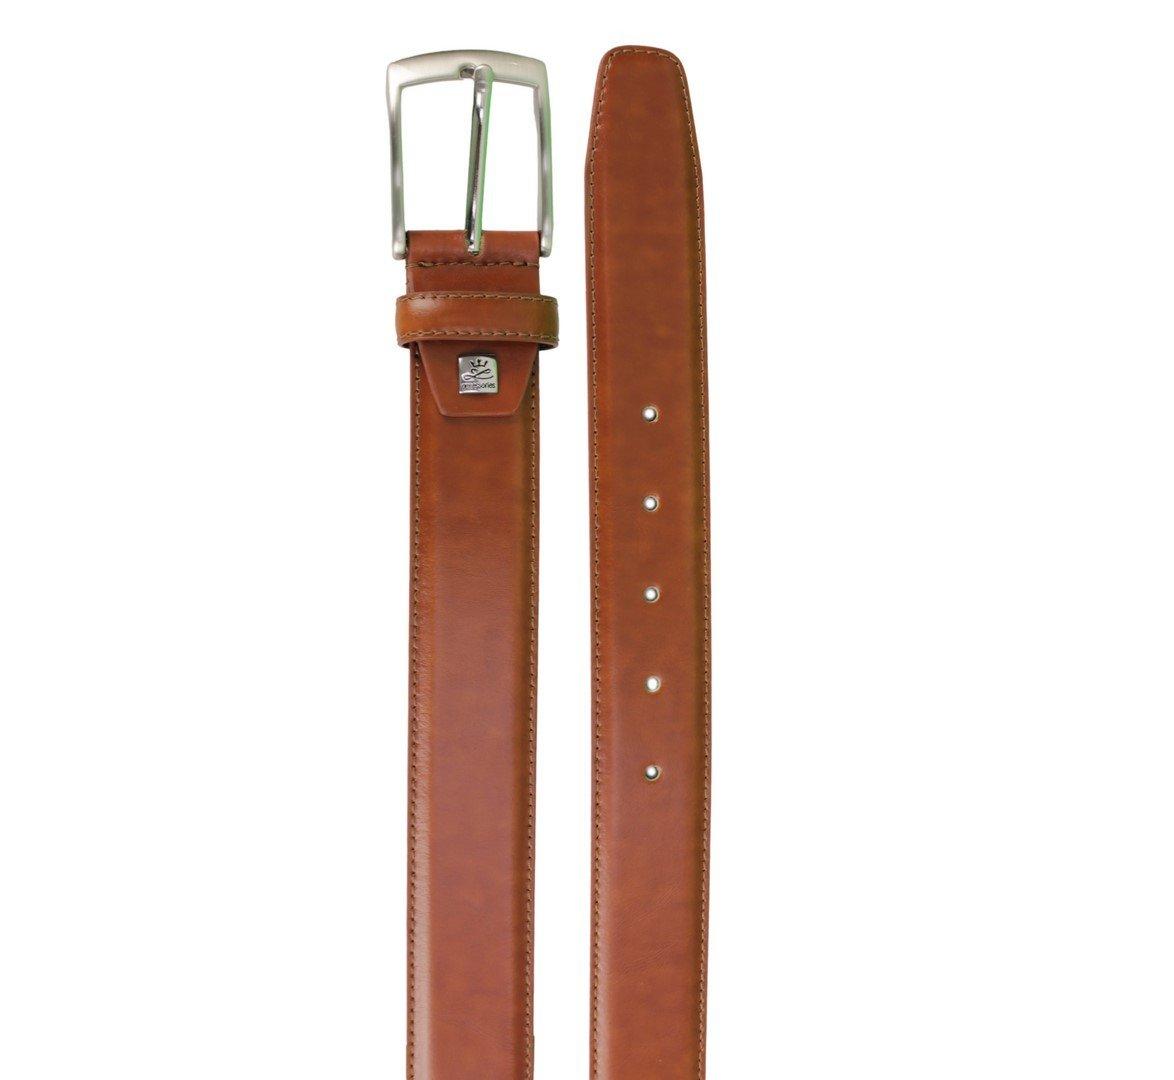 Lindenmann Herren Ledergürtel Anzug Gürtel Leder braun Cognac 1000980 022